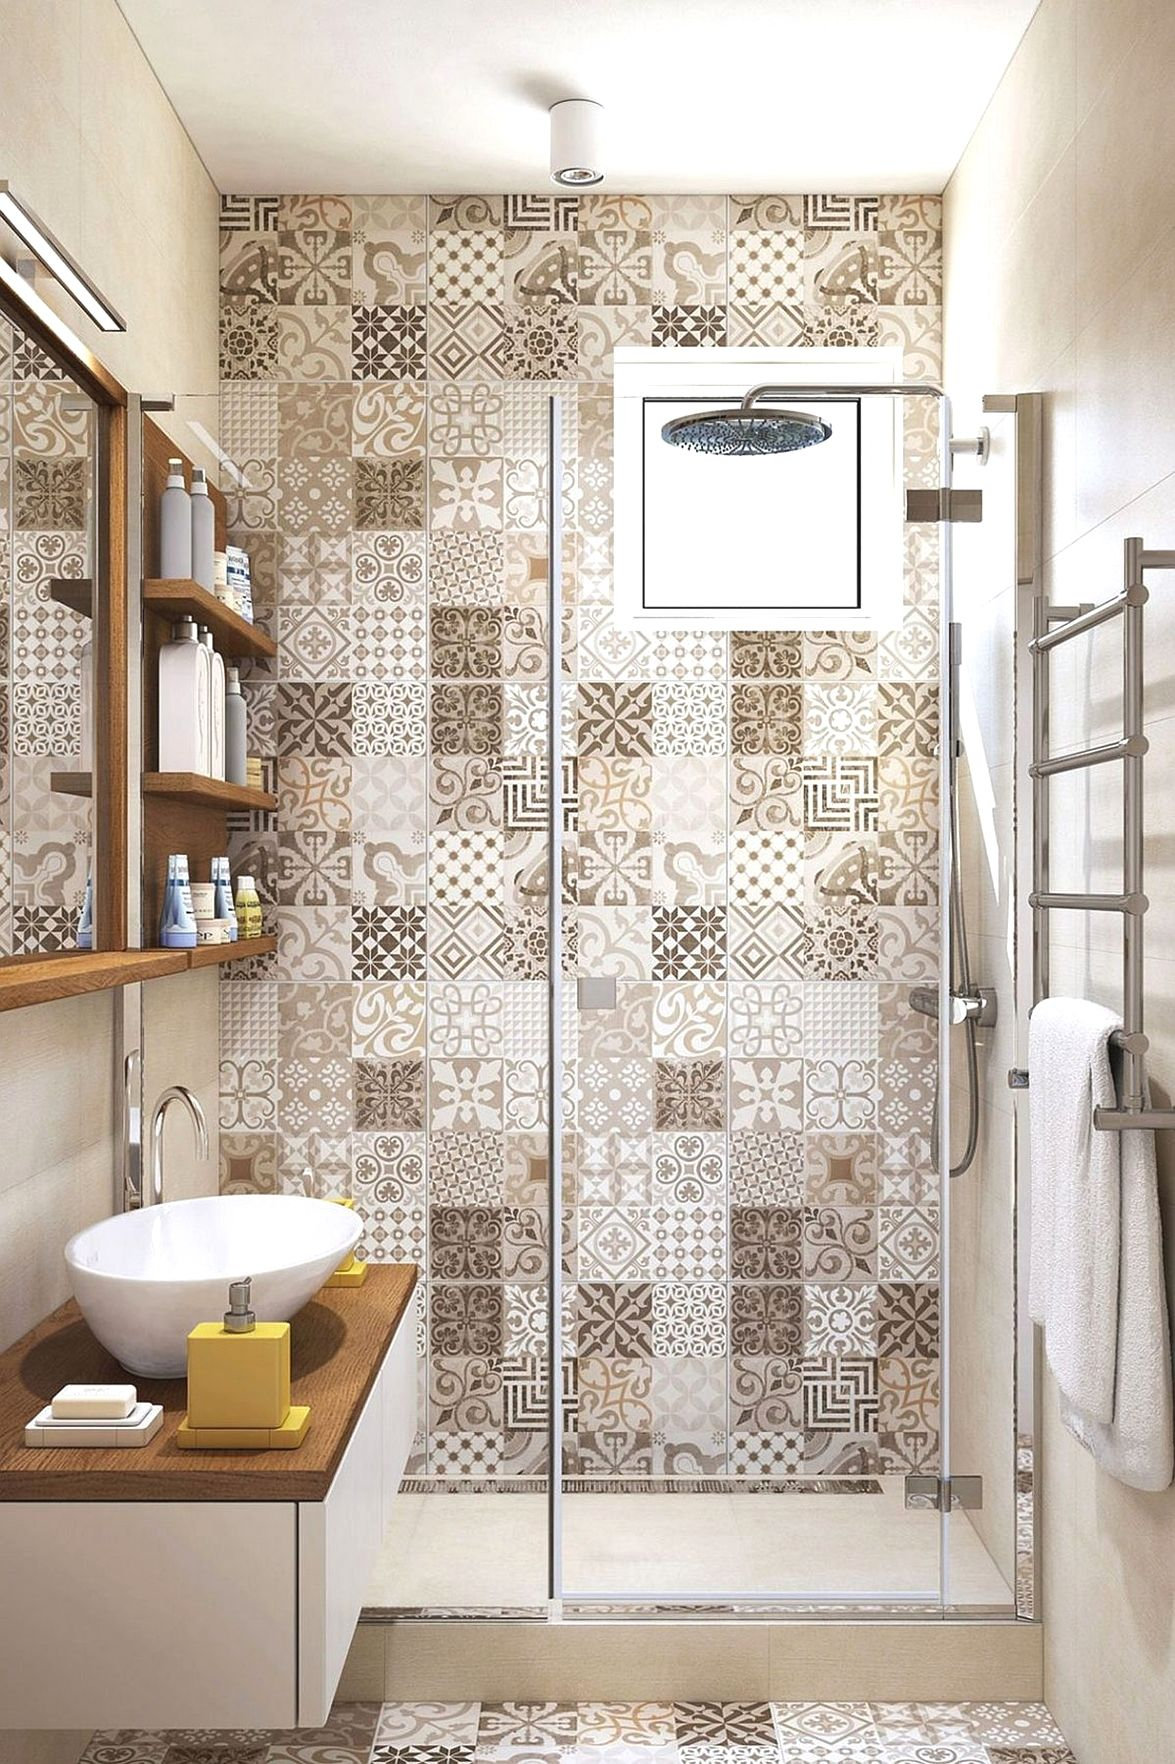 remodeling bathroom shower diy bathroom remodeling in 2018 rh pinterest com bathroom shower dispensers diy bathroom shower cleaner